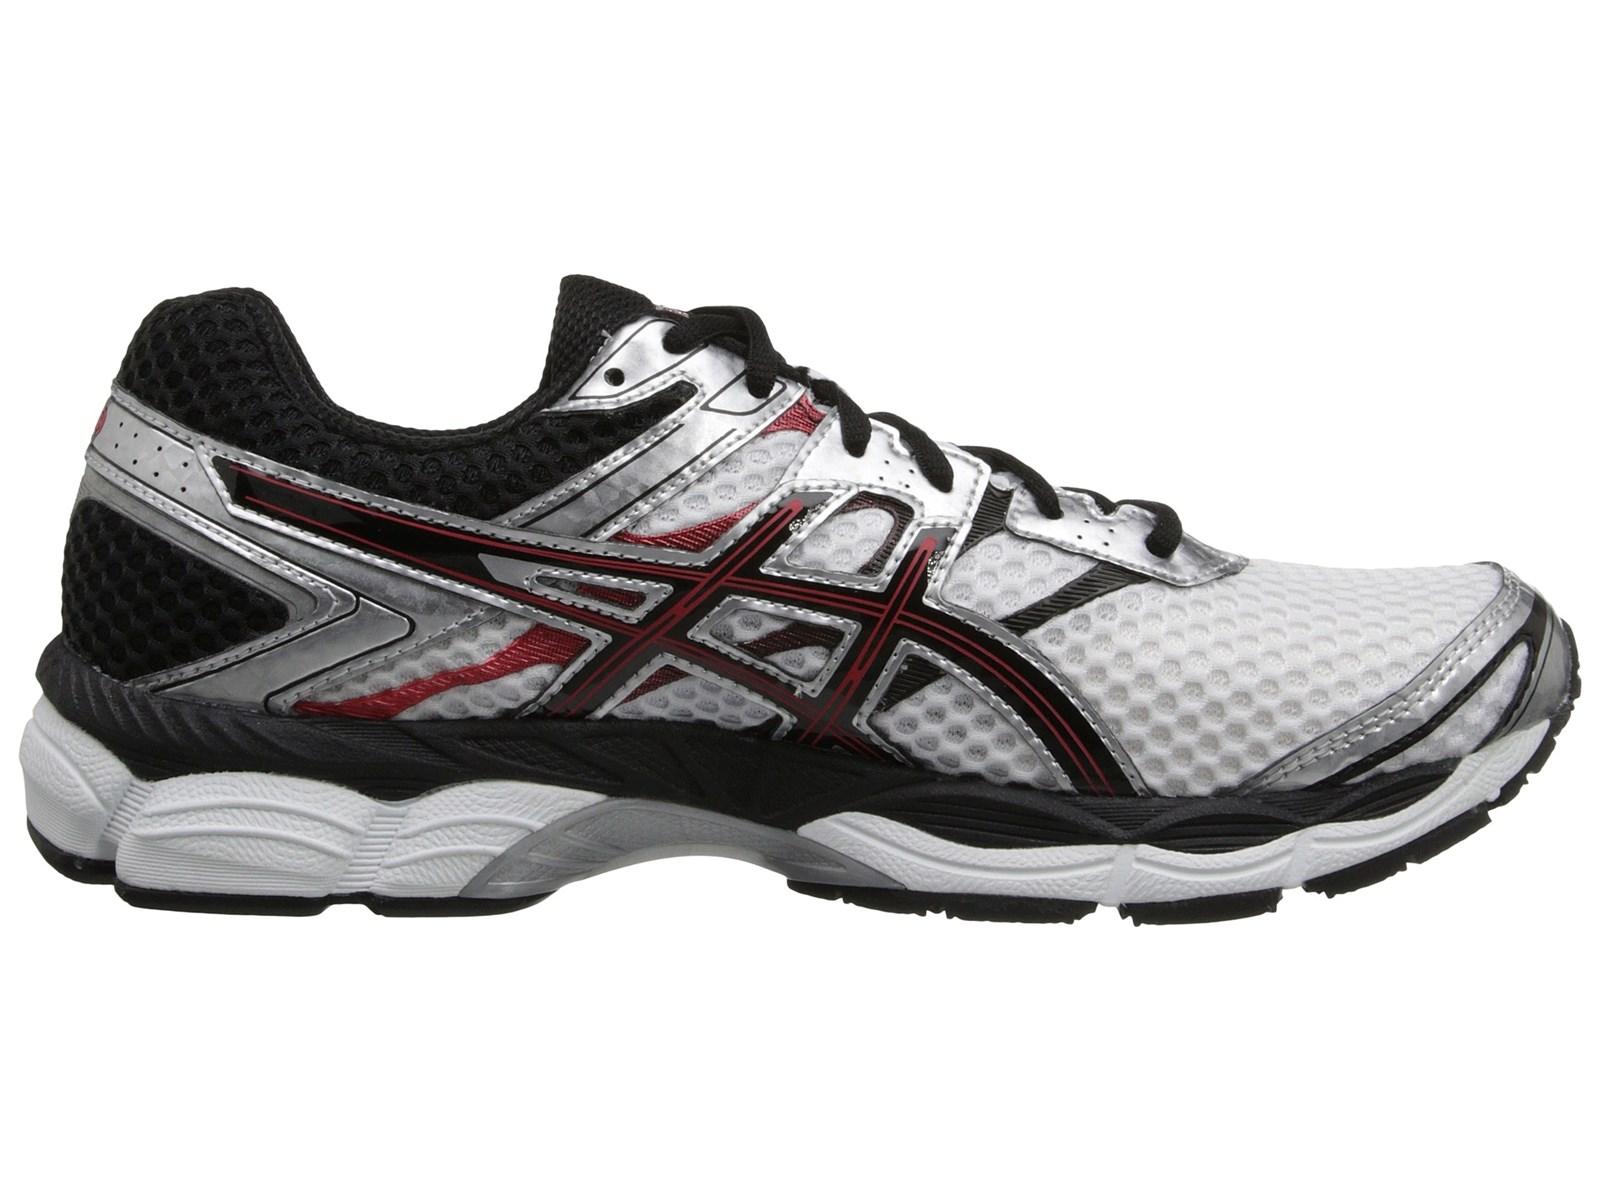 new asics gel cumulus 16 running shoes mens size 11 ebay